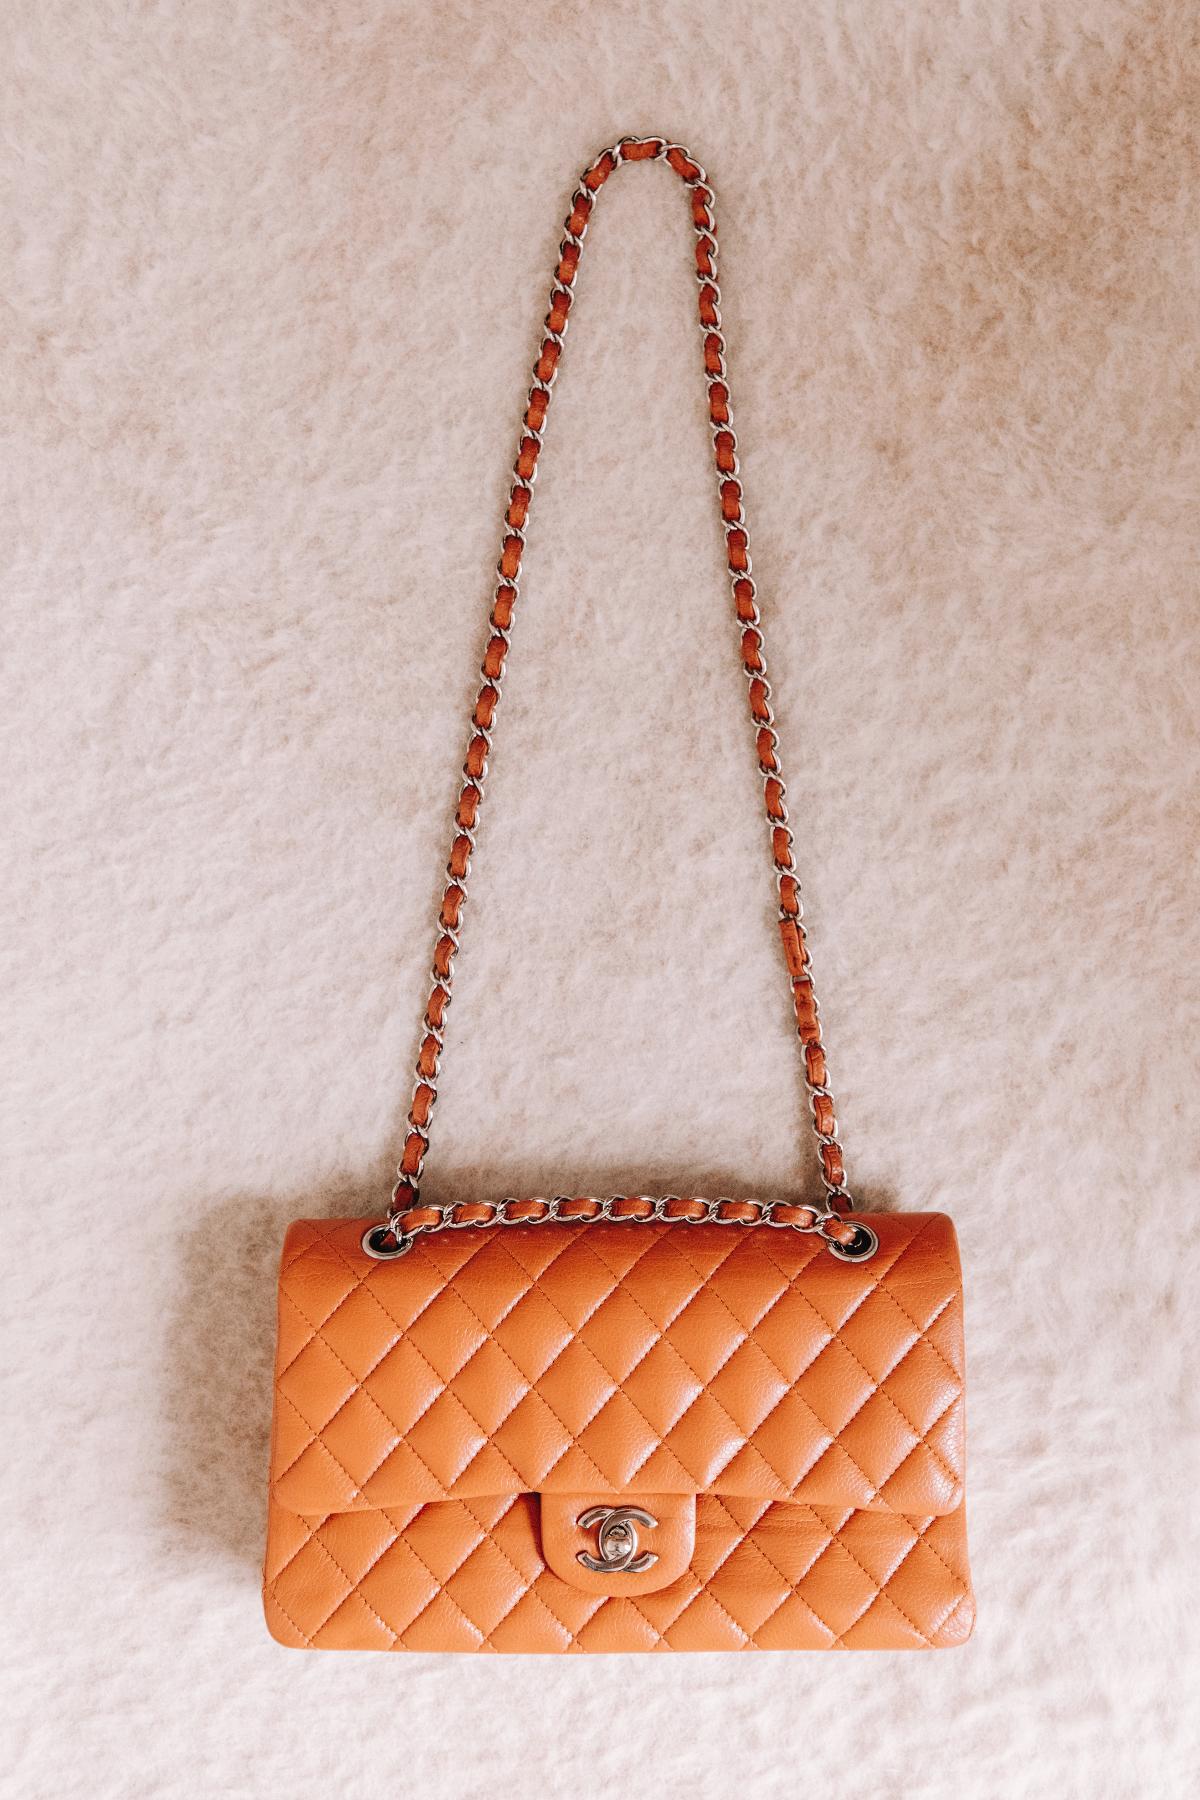 Fashion Jackson Chanel Classic Flap Medium Caramel Handbag with Silver Hardware